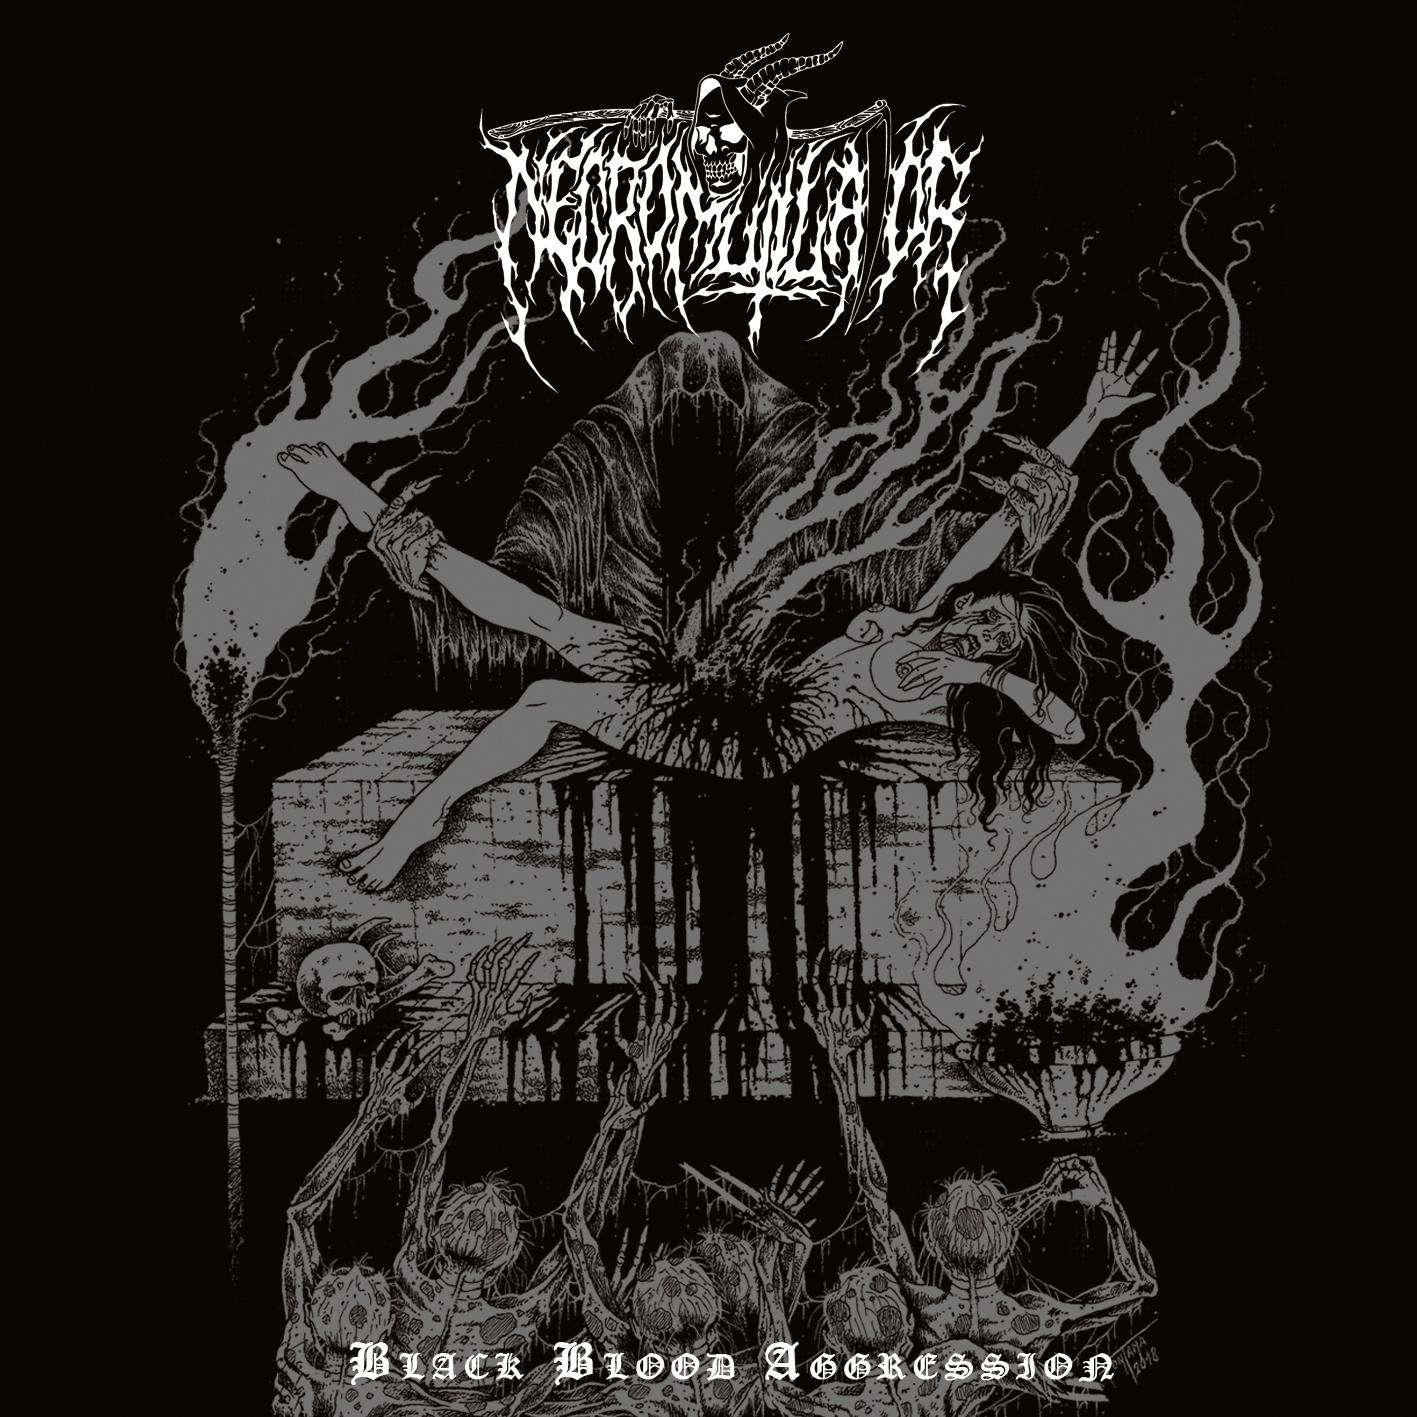 Necromutilator - Black Blood Aggression (CD)